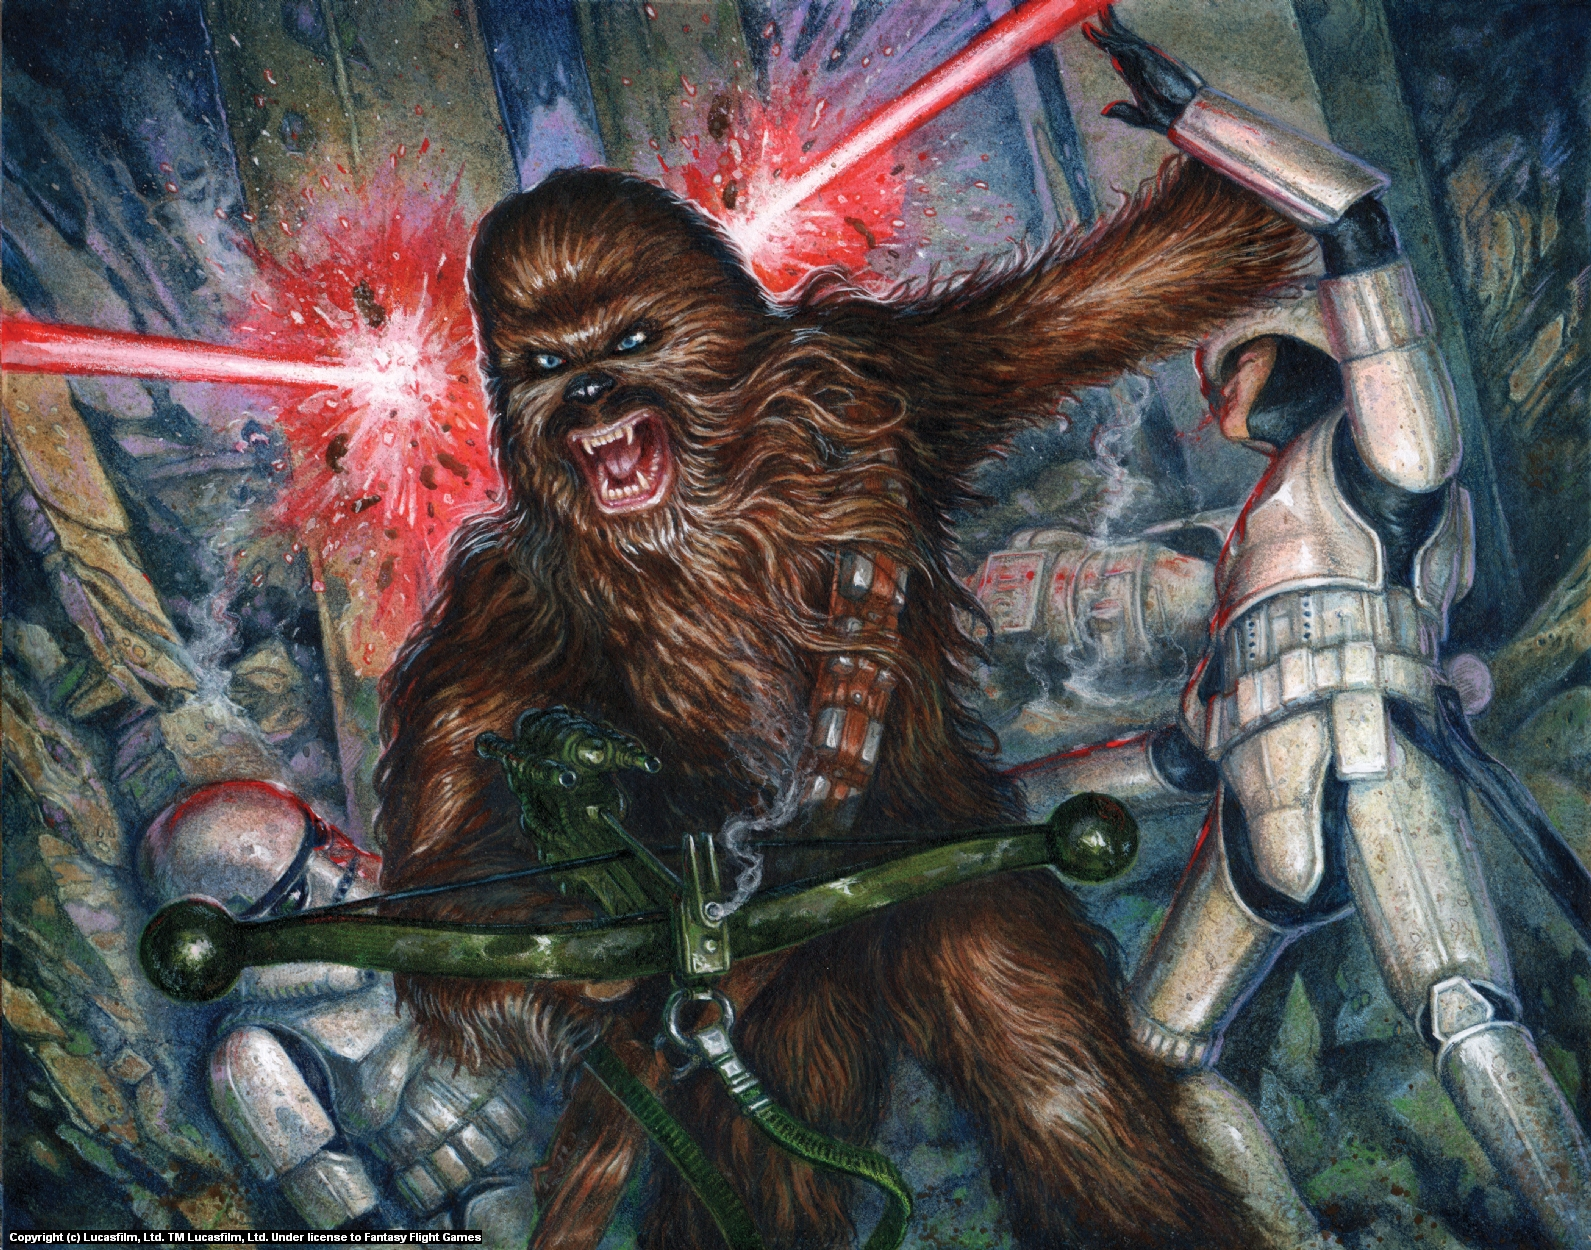 Chewbacca Artwork by Christopher Burdett